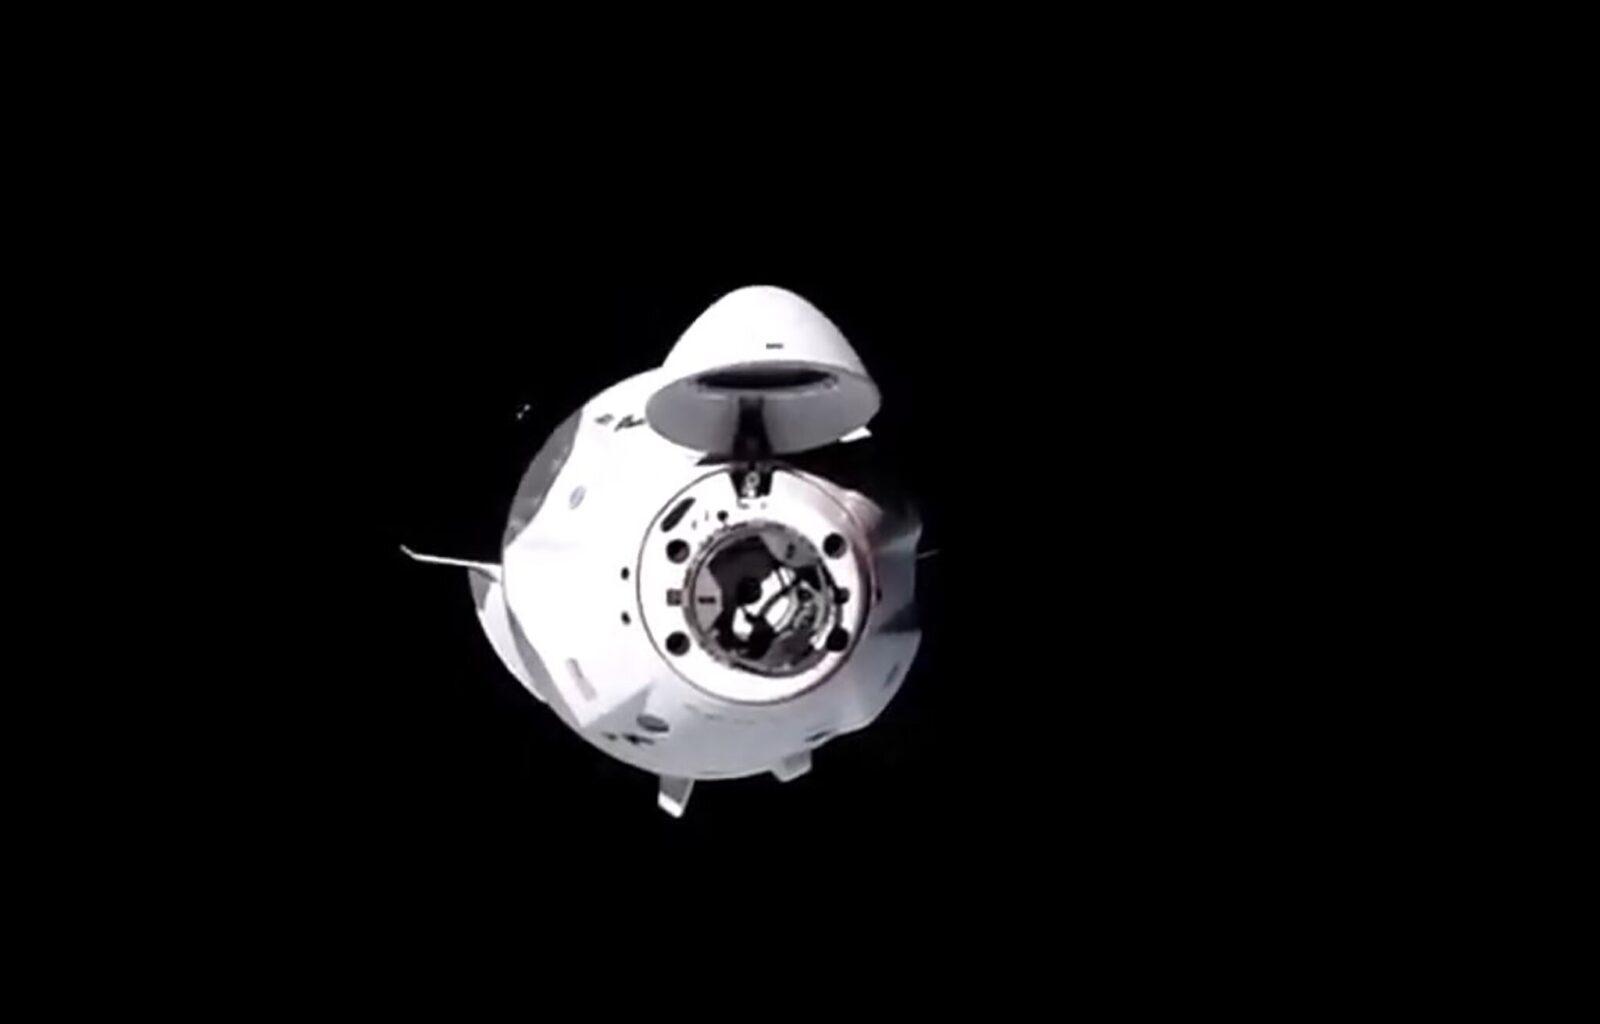 SpaceX пристыковался к Международной космической станции (merlin 180119259 7a6509f8 bf69 42e6 ba7e 982e4d43f3dd superJumbo)